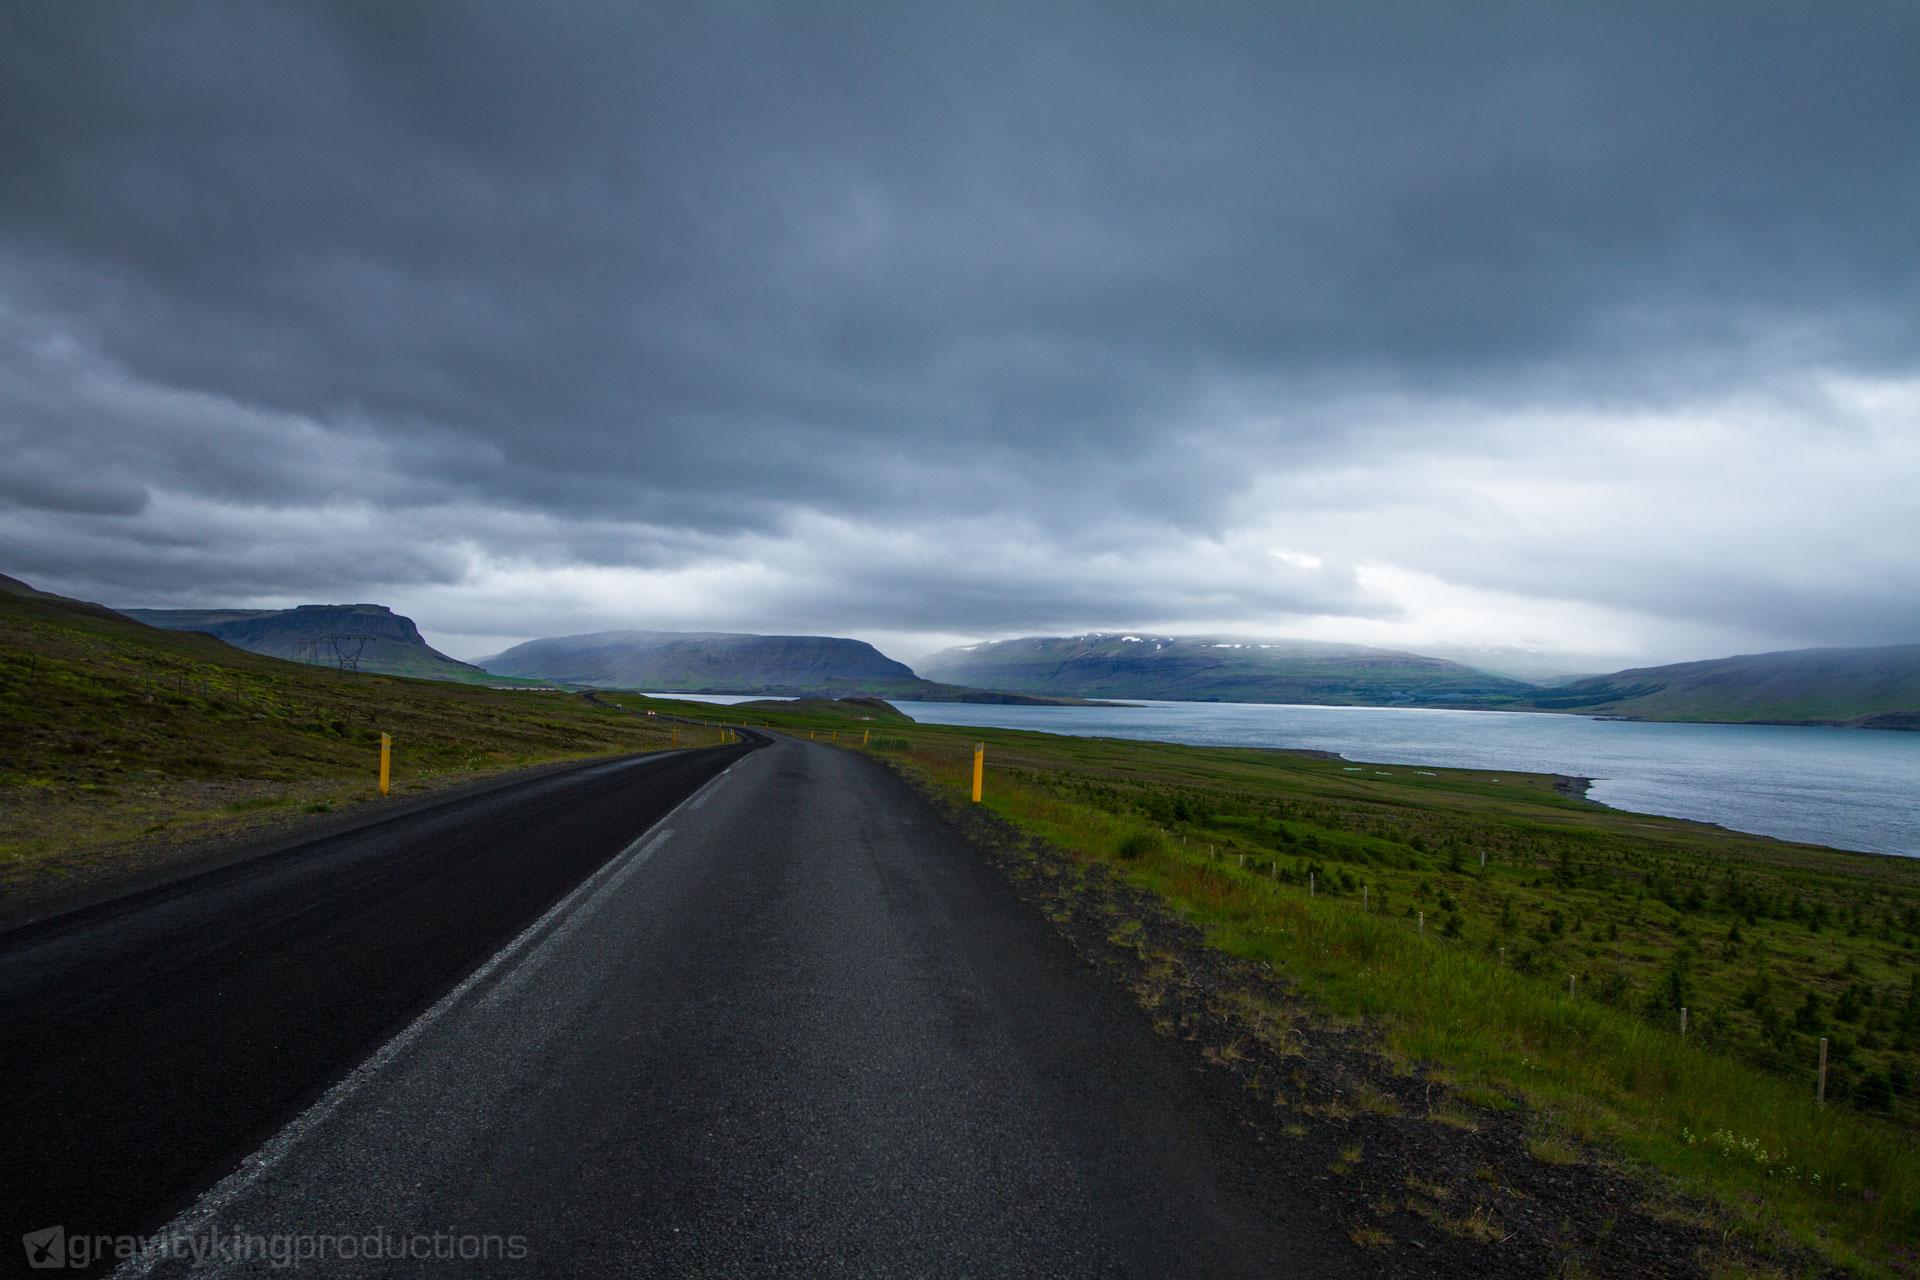 A look inside the Hvalfjörður, on of countless fjords in Iceland.